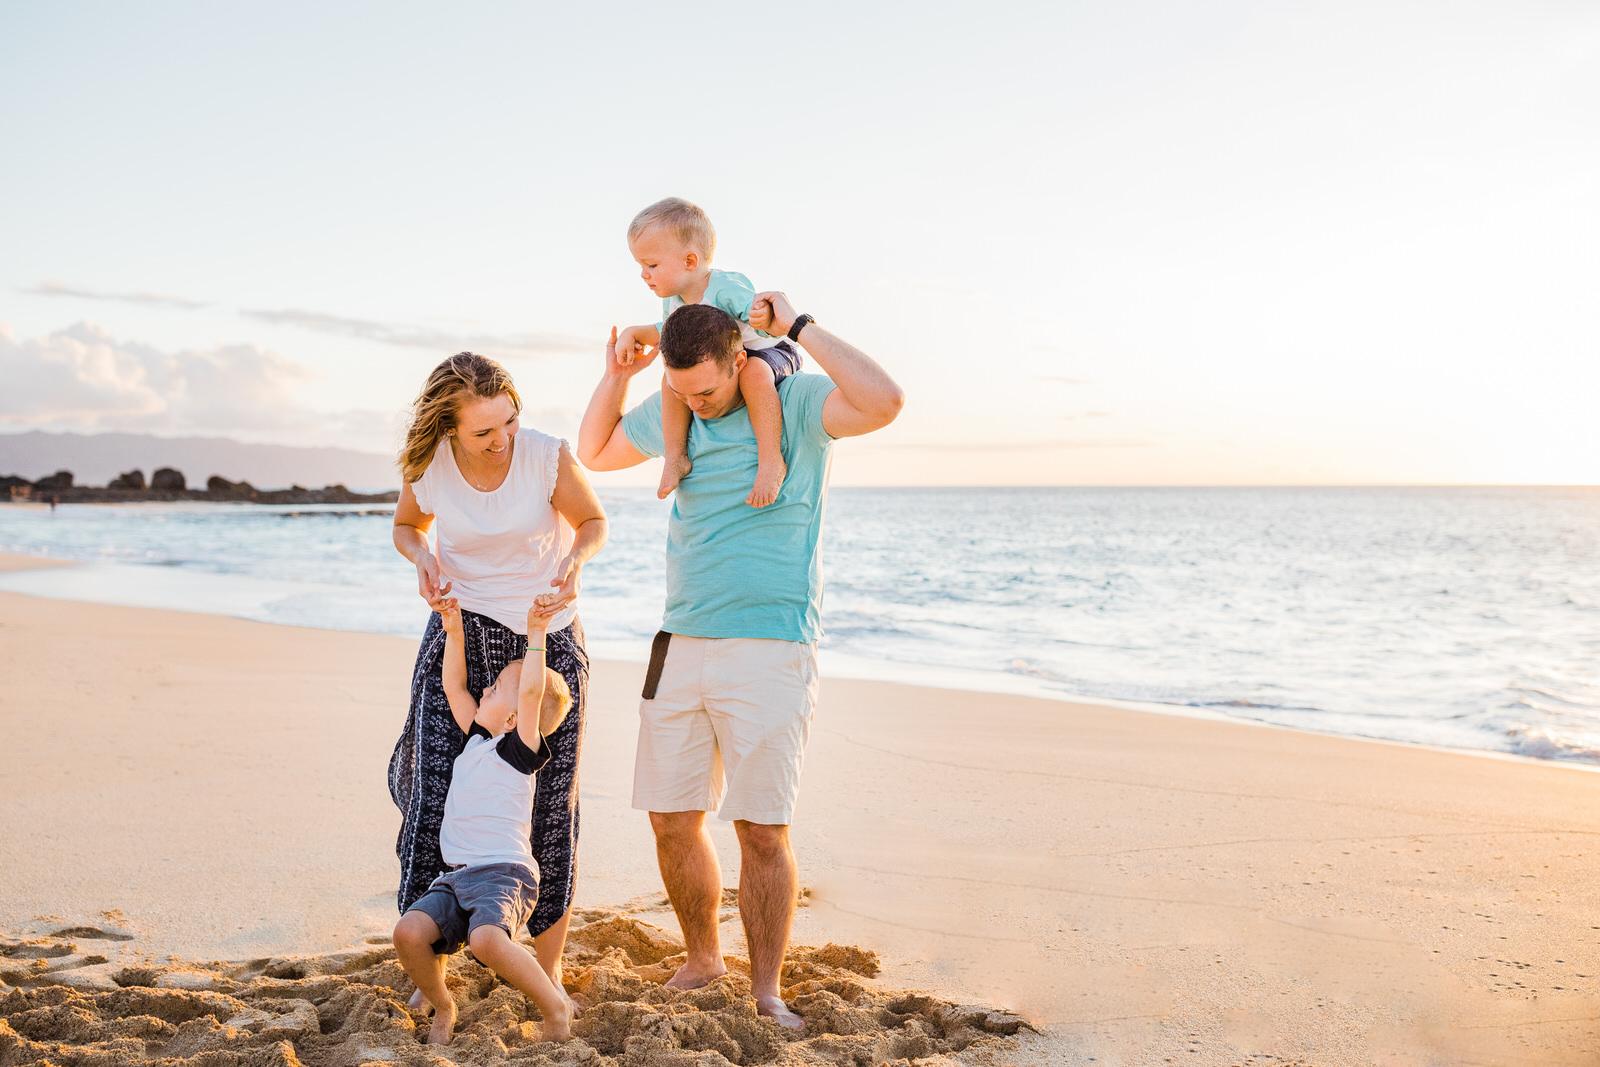 extended-family-big-island-vacation-cousins-grandparents-beach-waikoloa-sunset-hawaii-7187.jpg